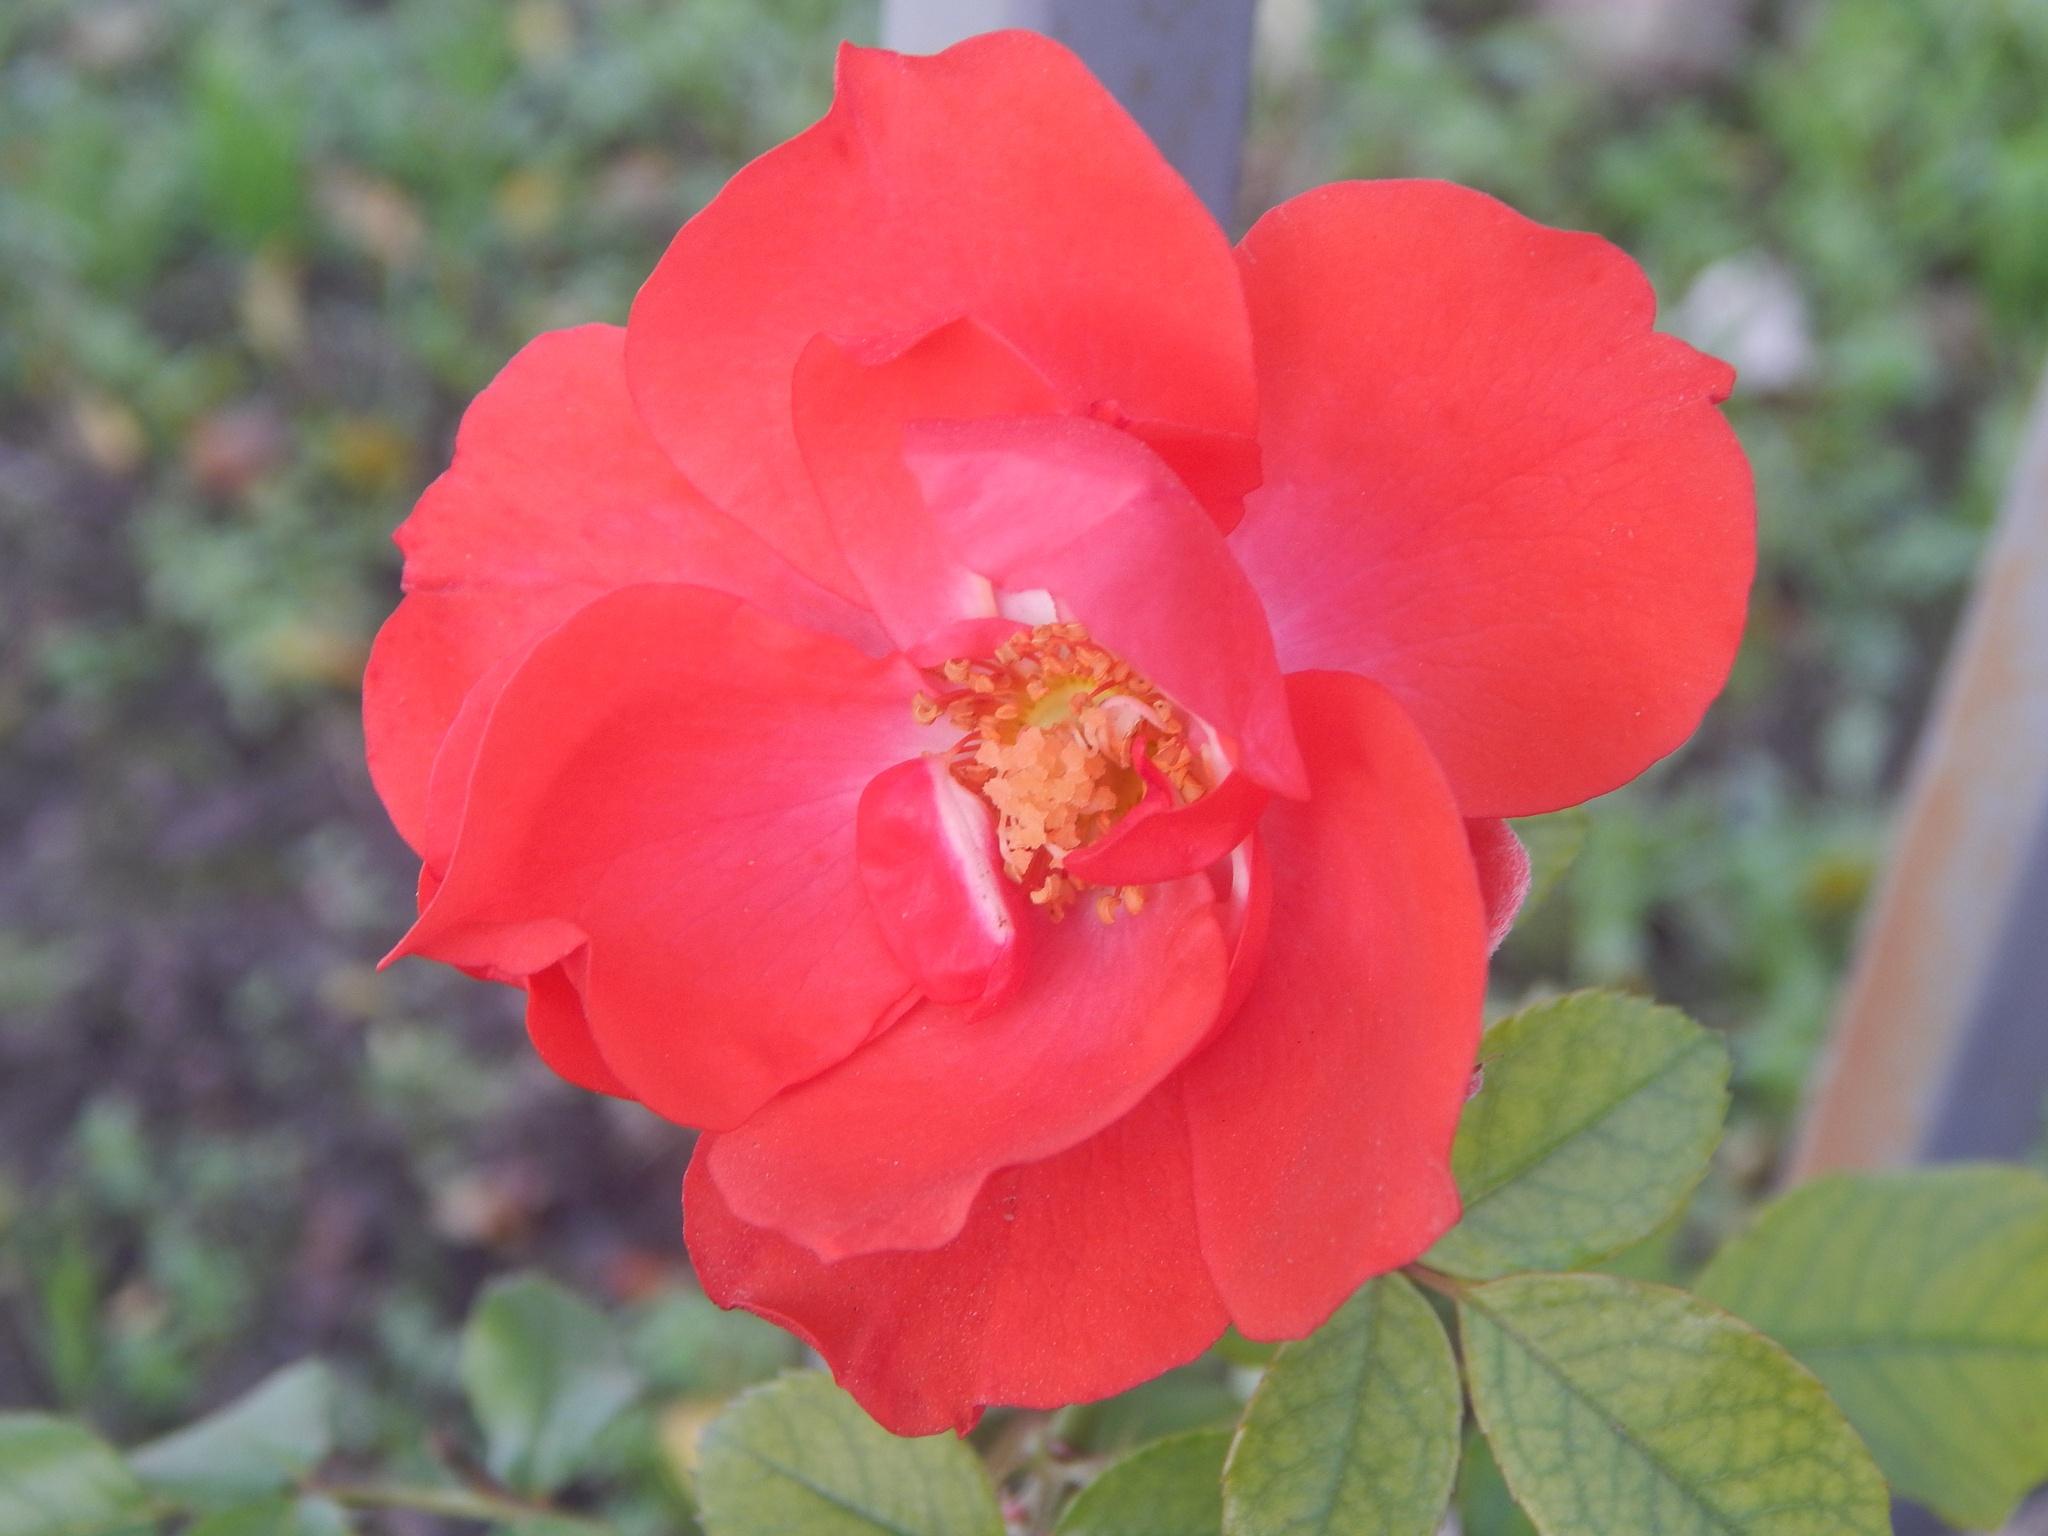 red rose by Goran Vuletic